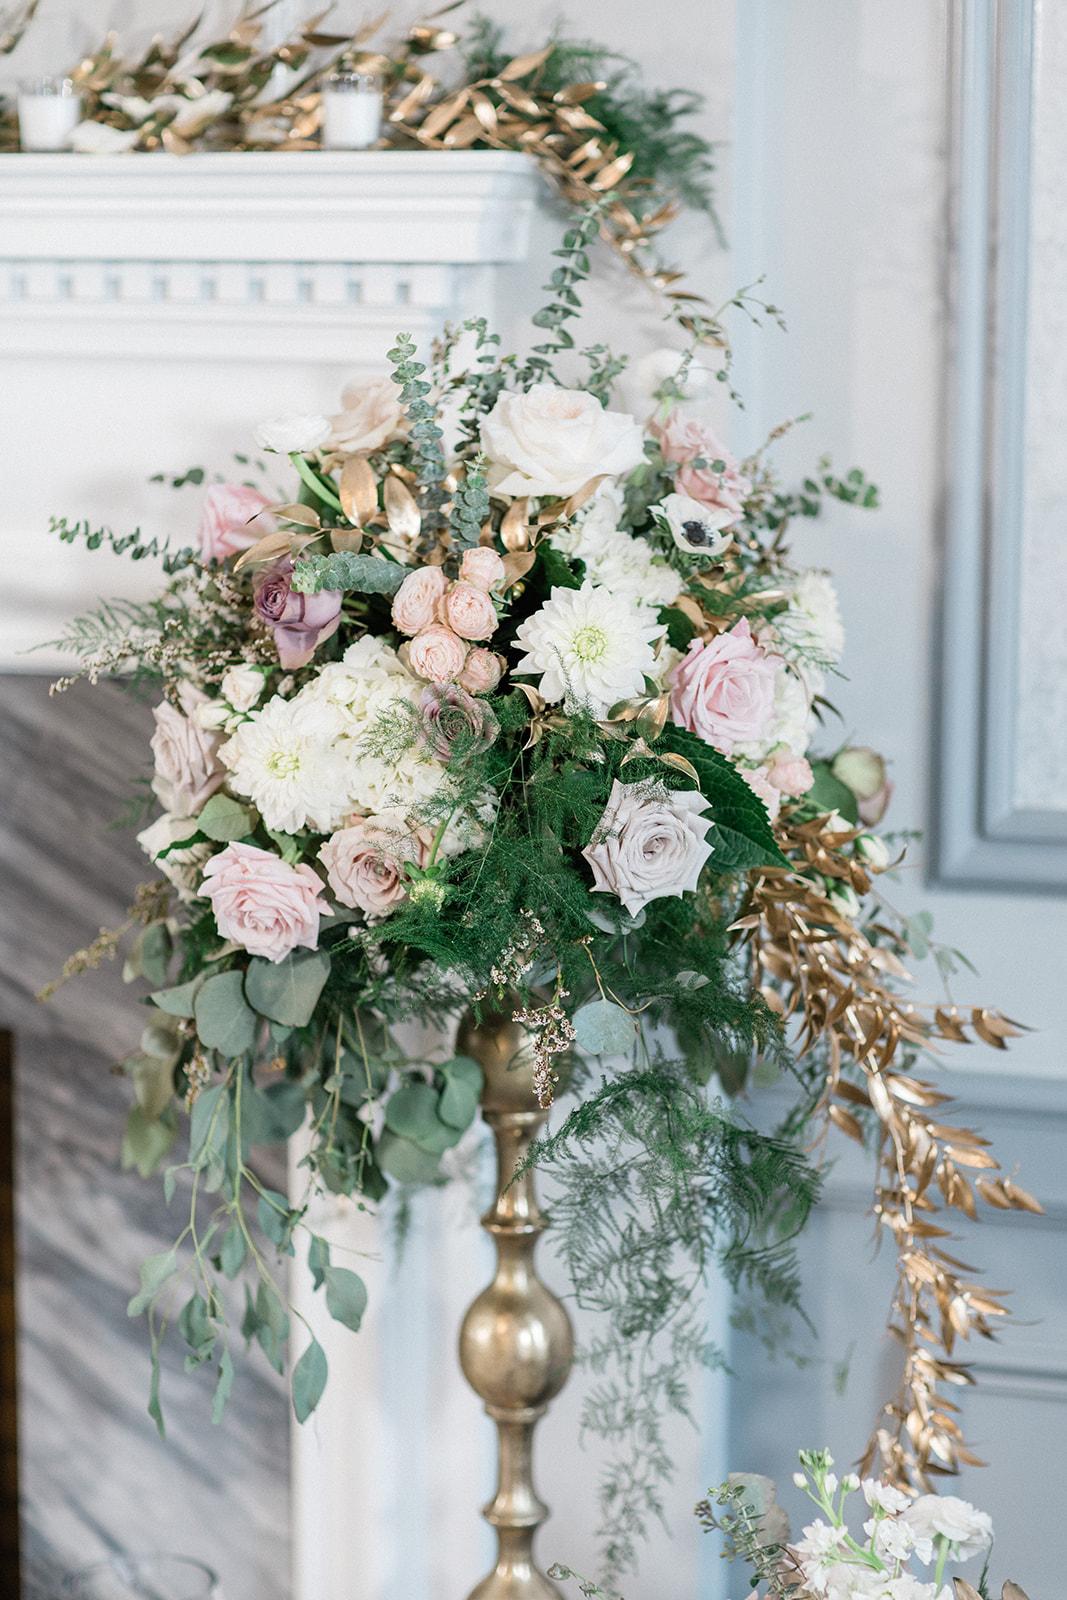 LisaCatherinePhotography_Jasmeen&Darren_Wedding-856_websize.jpg